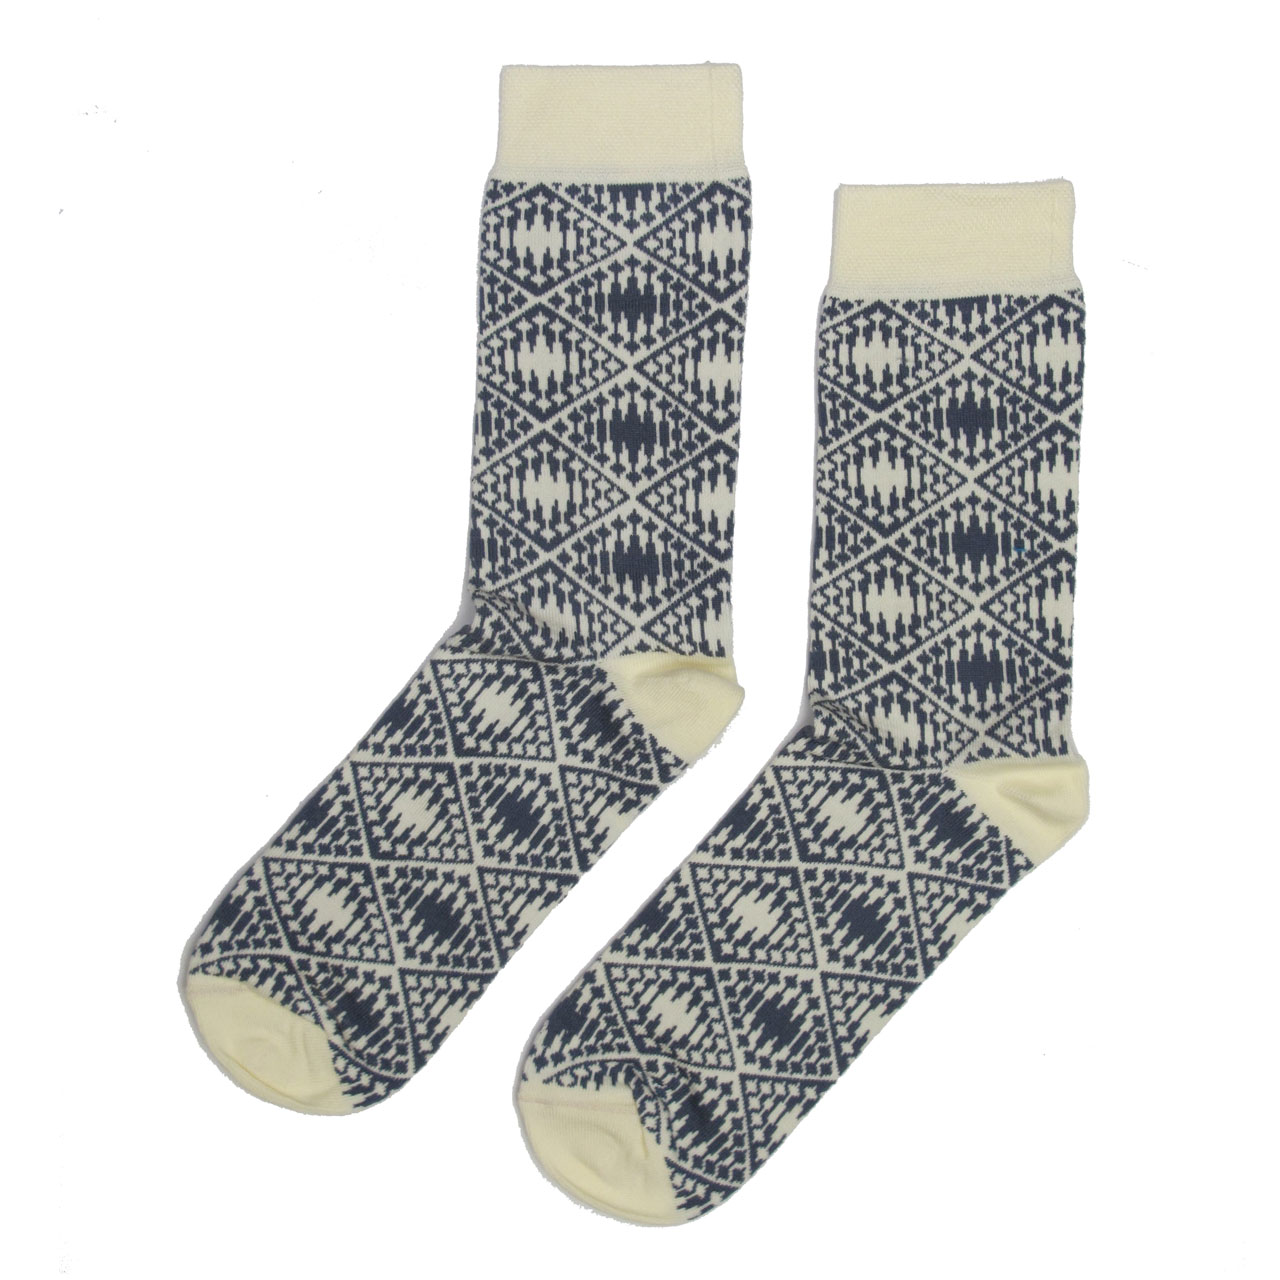 Berlin Design Socken, Fernsehturm creme/grau